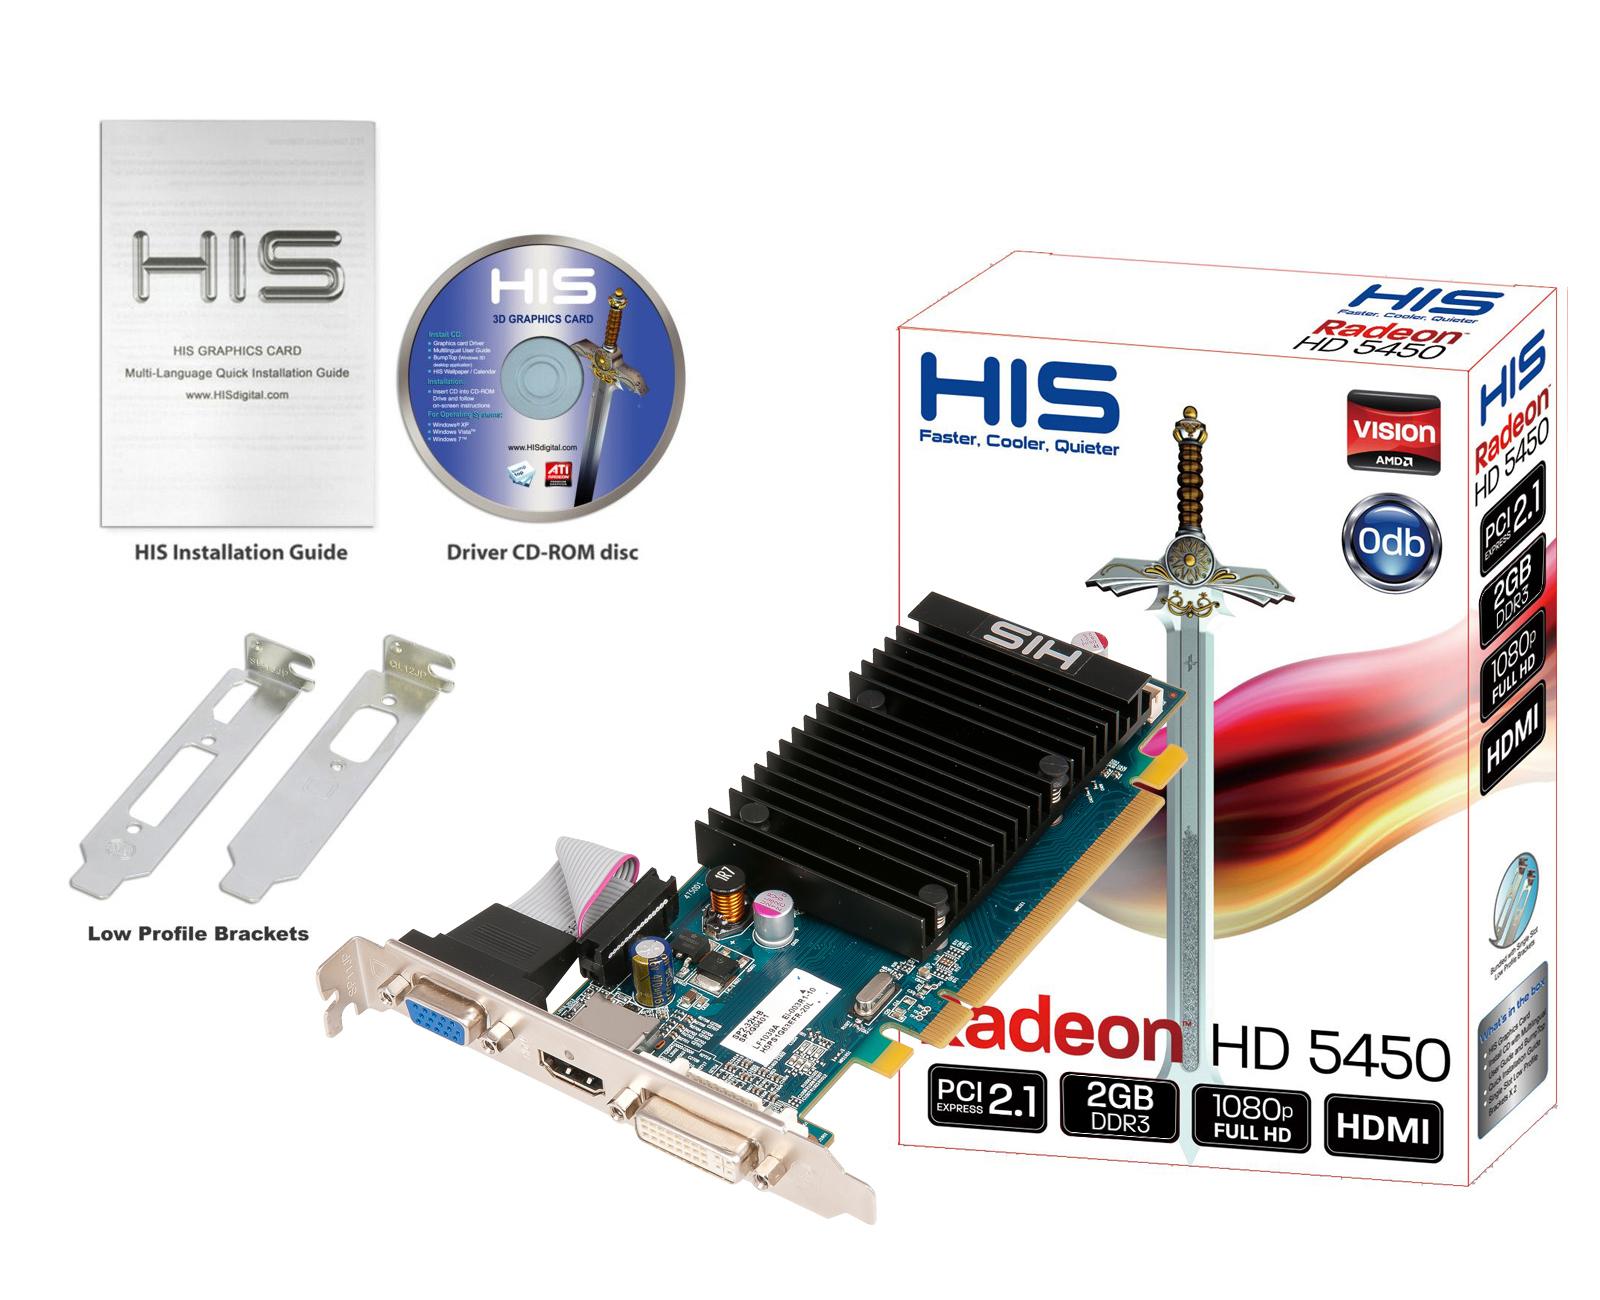 HIS 5450 Silence 2GB DDR3 PCI-E DVI/HDMI/VGA